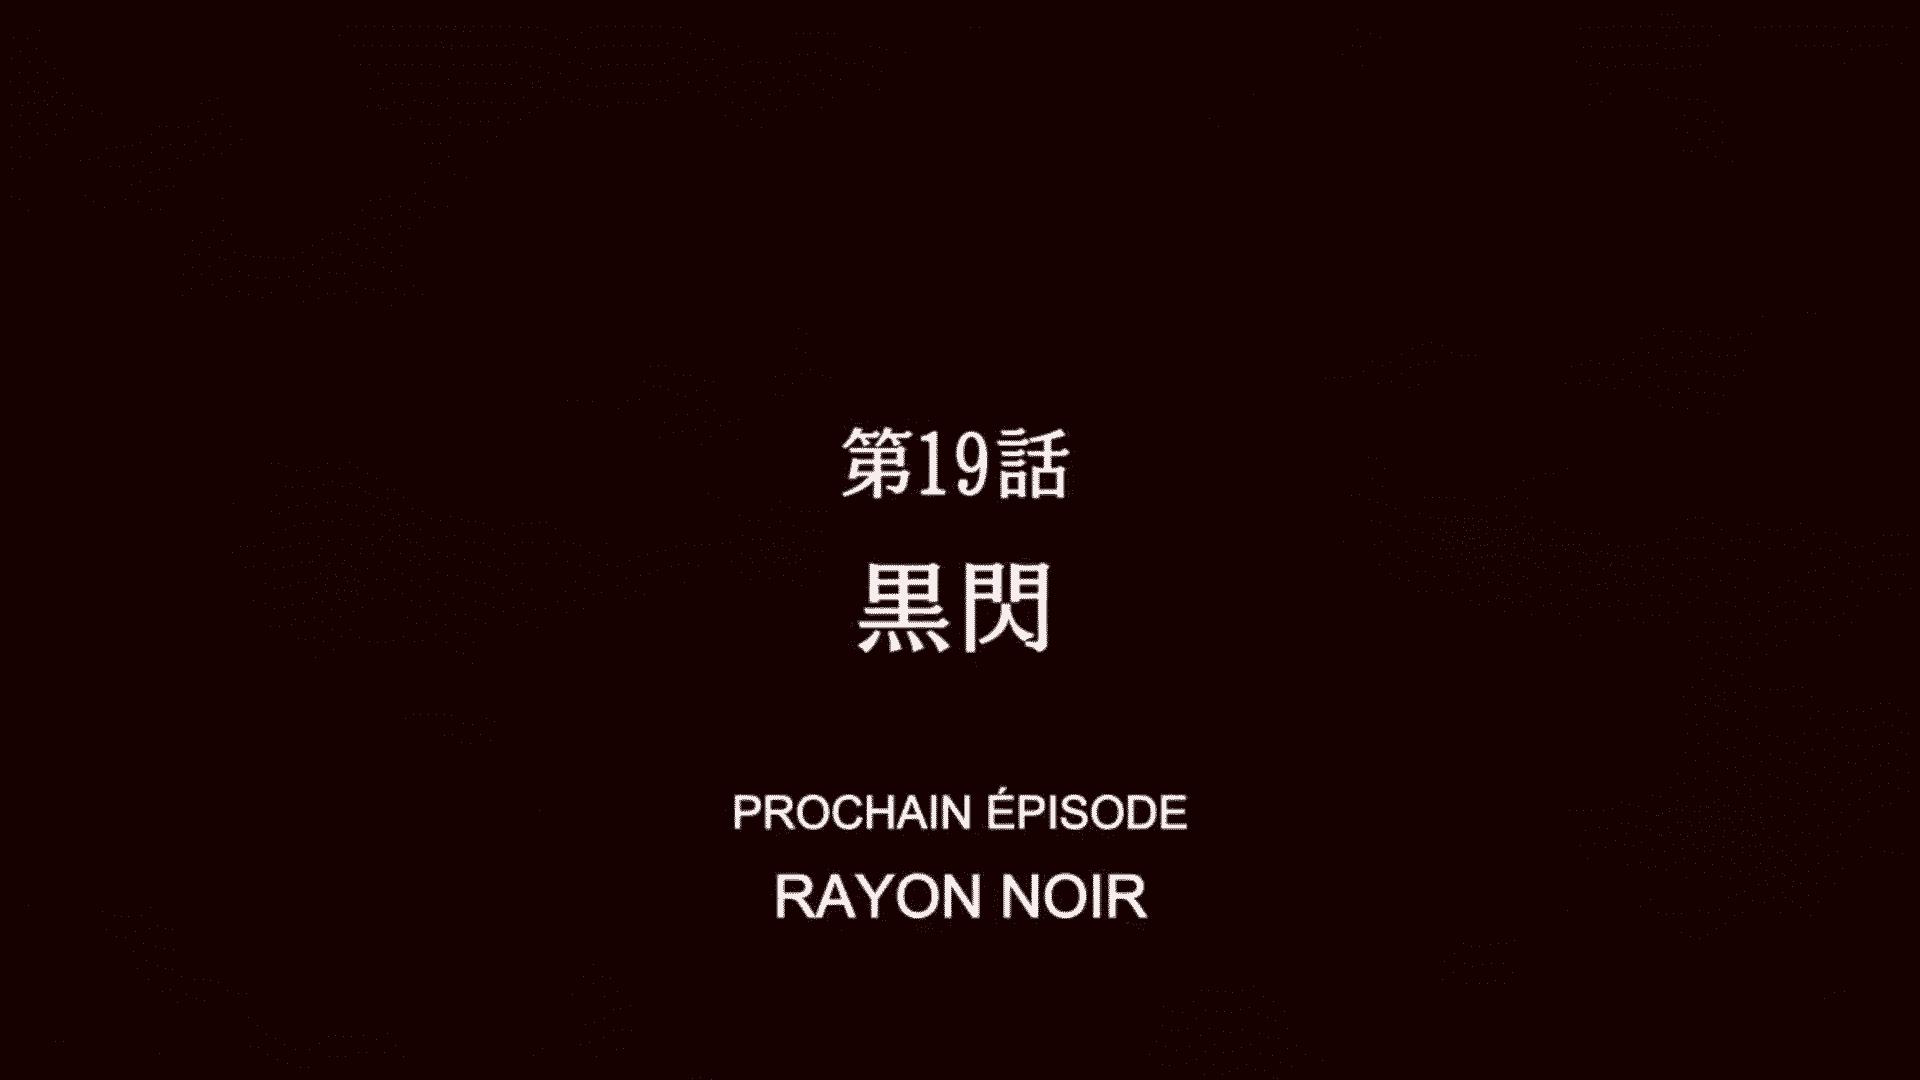 Jujutsu Kaisen 19 Vostfr Rayon Noir 19